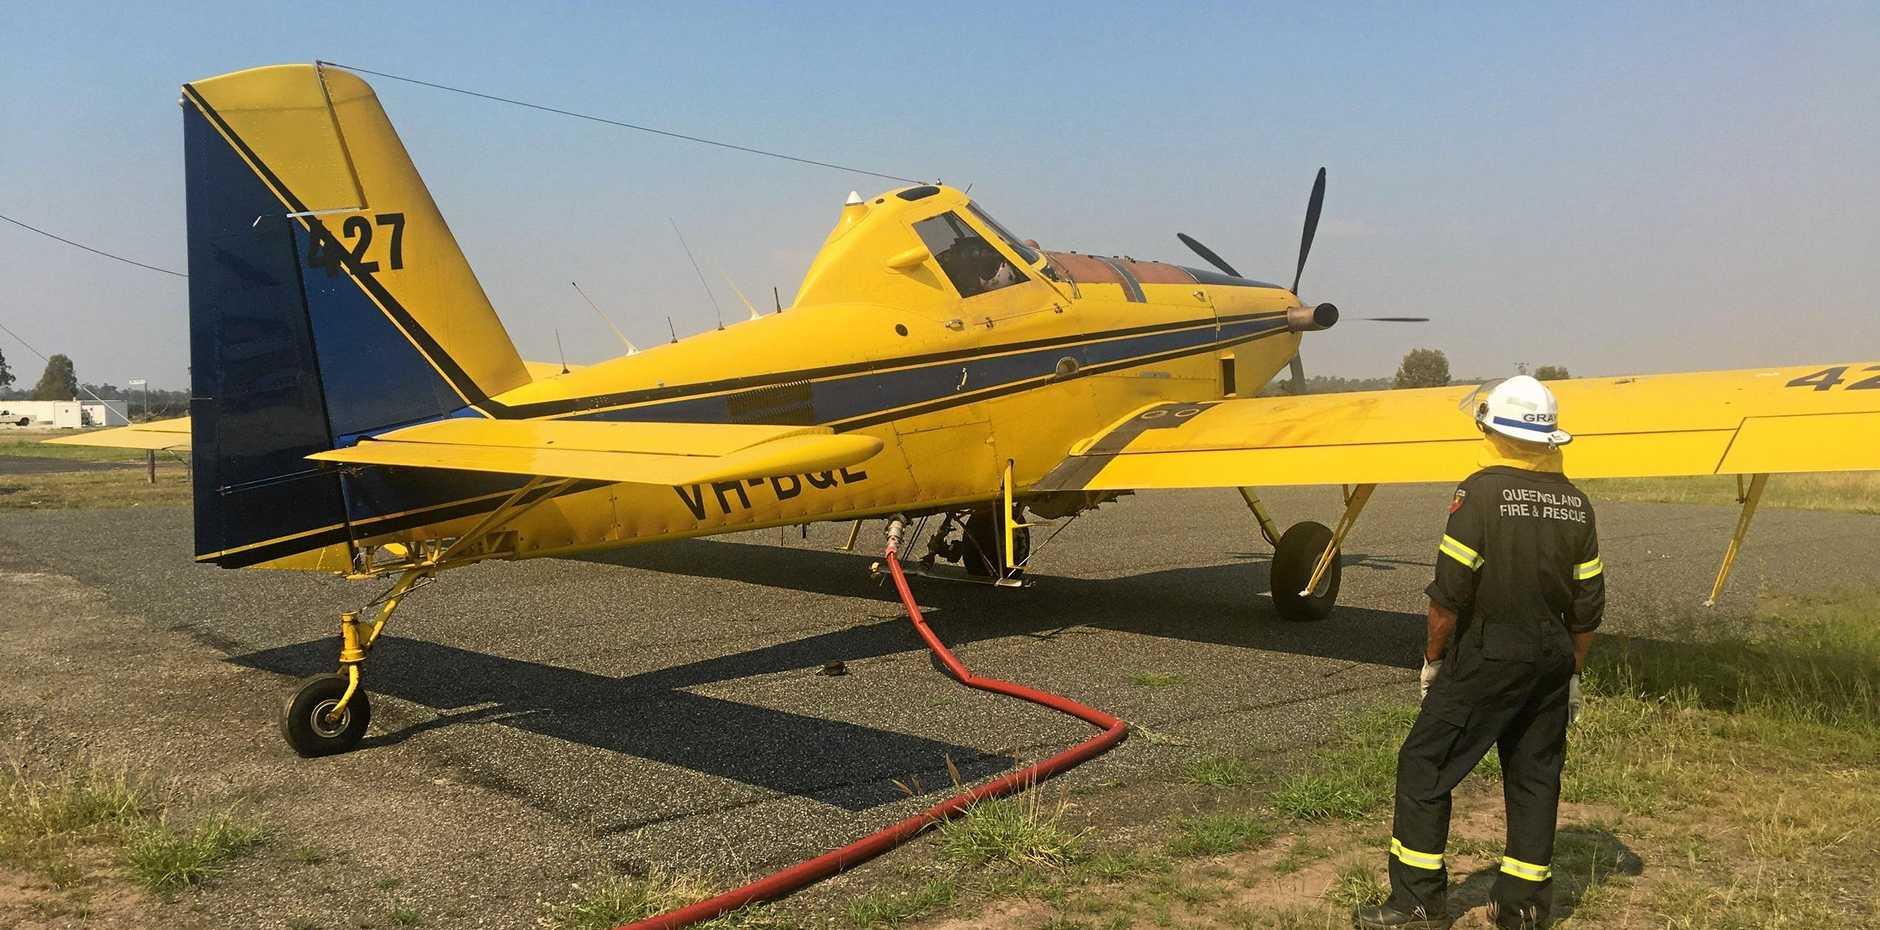 Water bombers preparing for take-off at Gayndah airport for the Kalpowar fires in December, 2018.